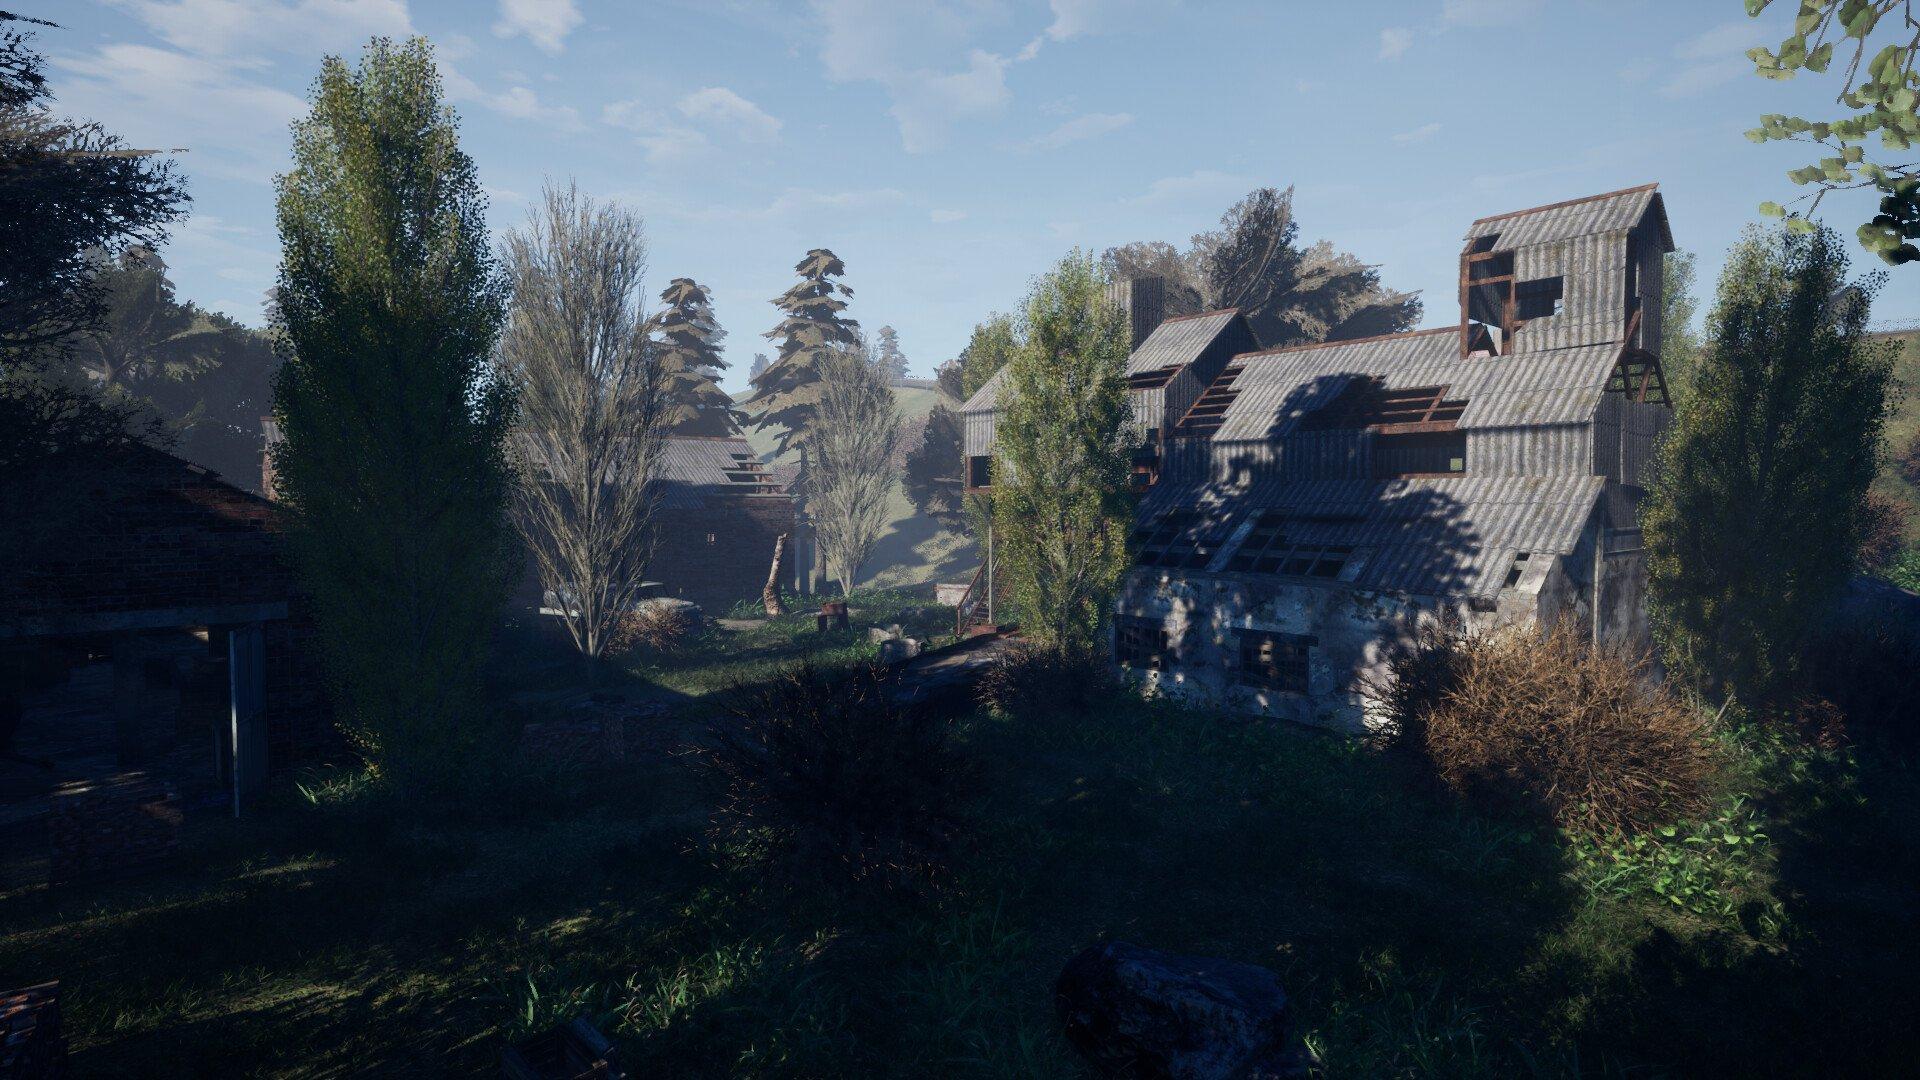 «S.T.A.L.K.E.R.: Unreal Engine 4» - скриншоты локации «Кордон»